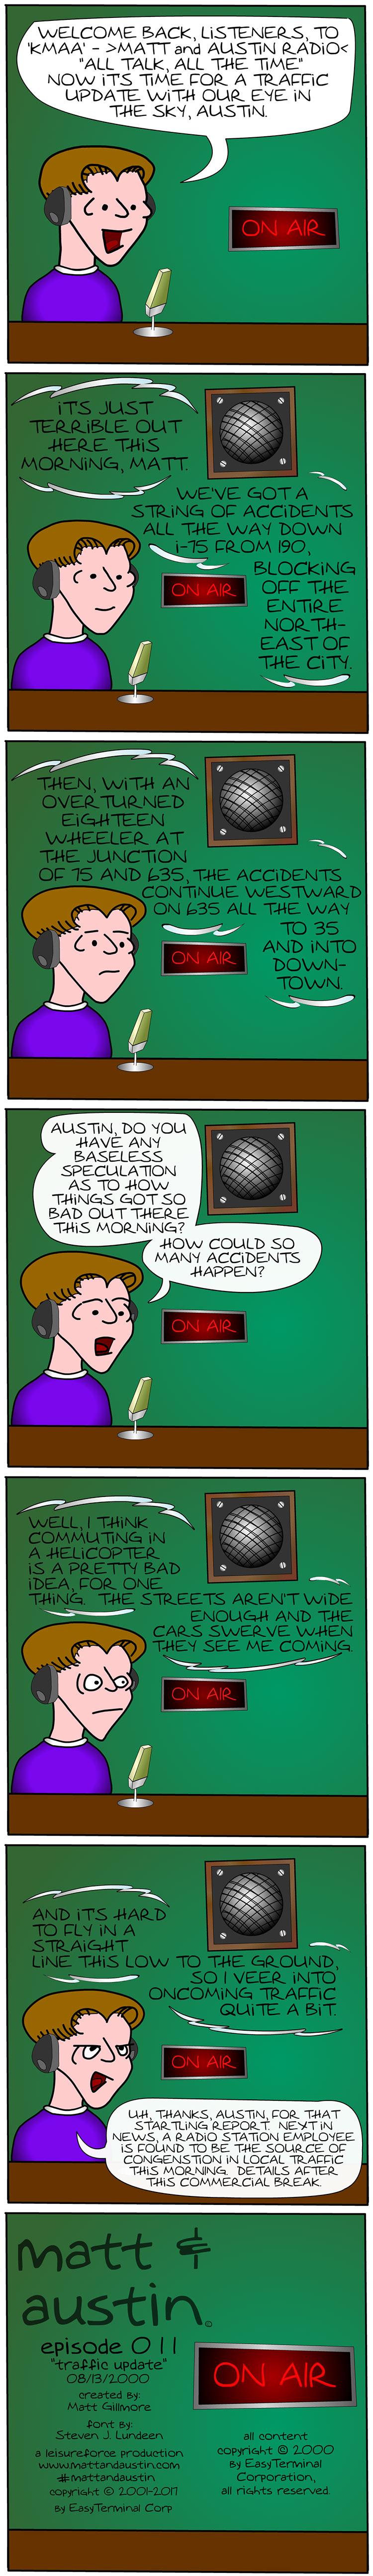 Webcomic The Matt And Austin Comic Strip #011 Traffic Update